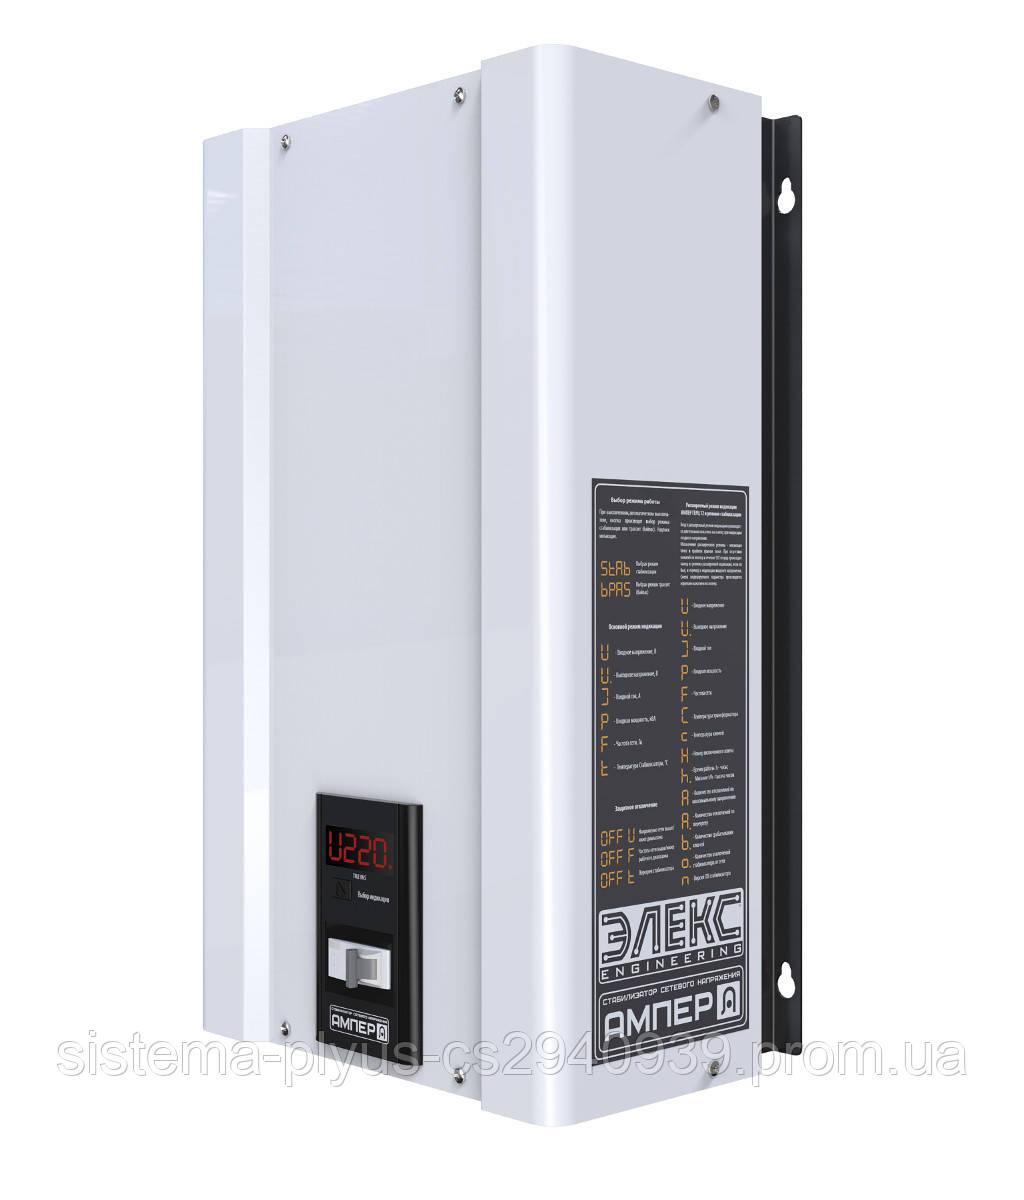 Стабилизатор напряжения Элекс Engineering Ампер 16-1/32А-Т (7000) v2.0